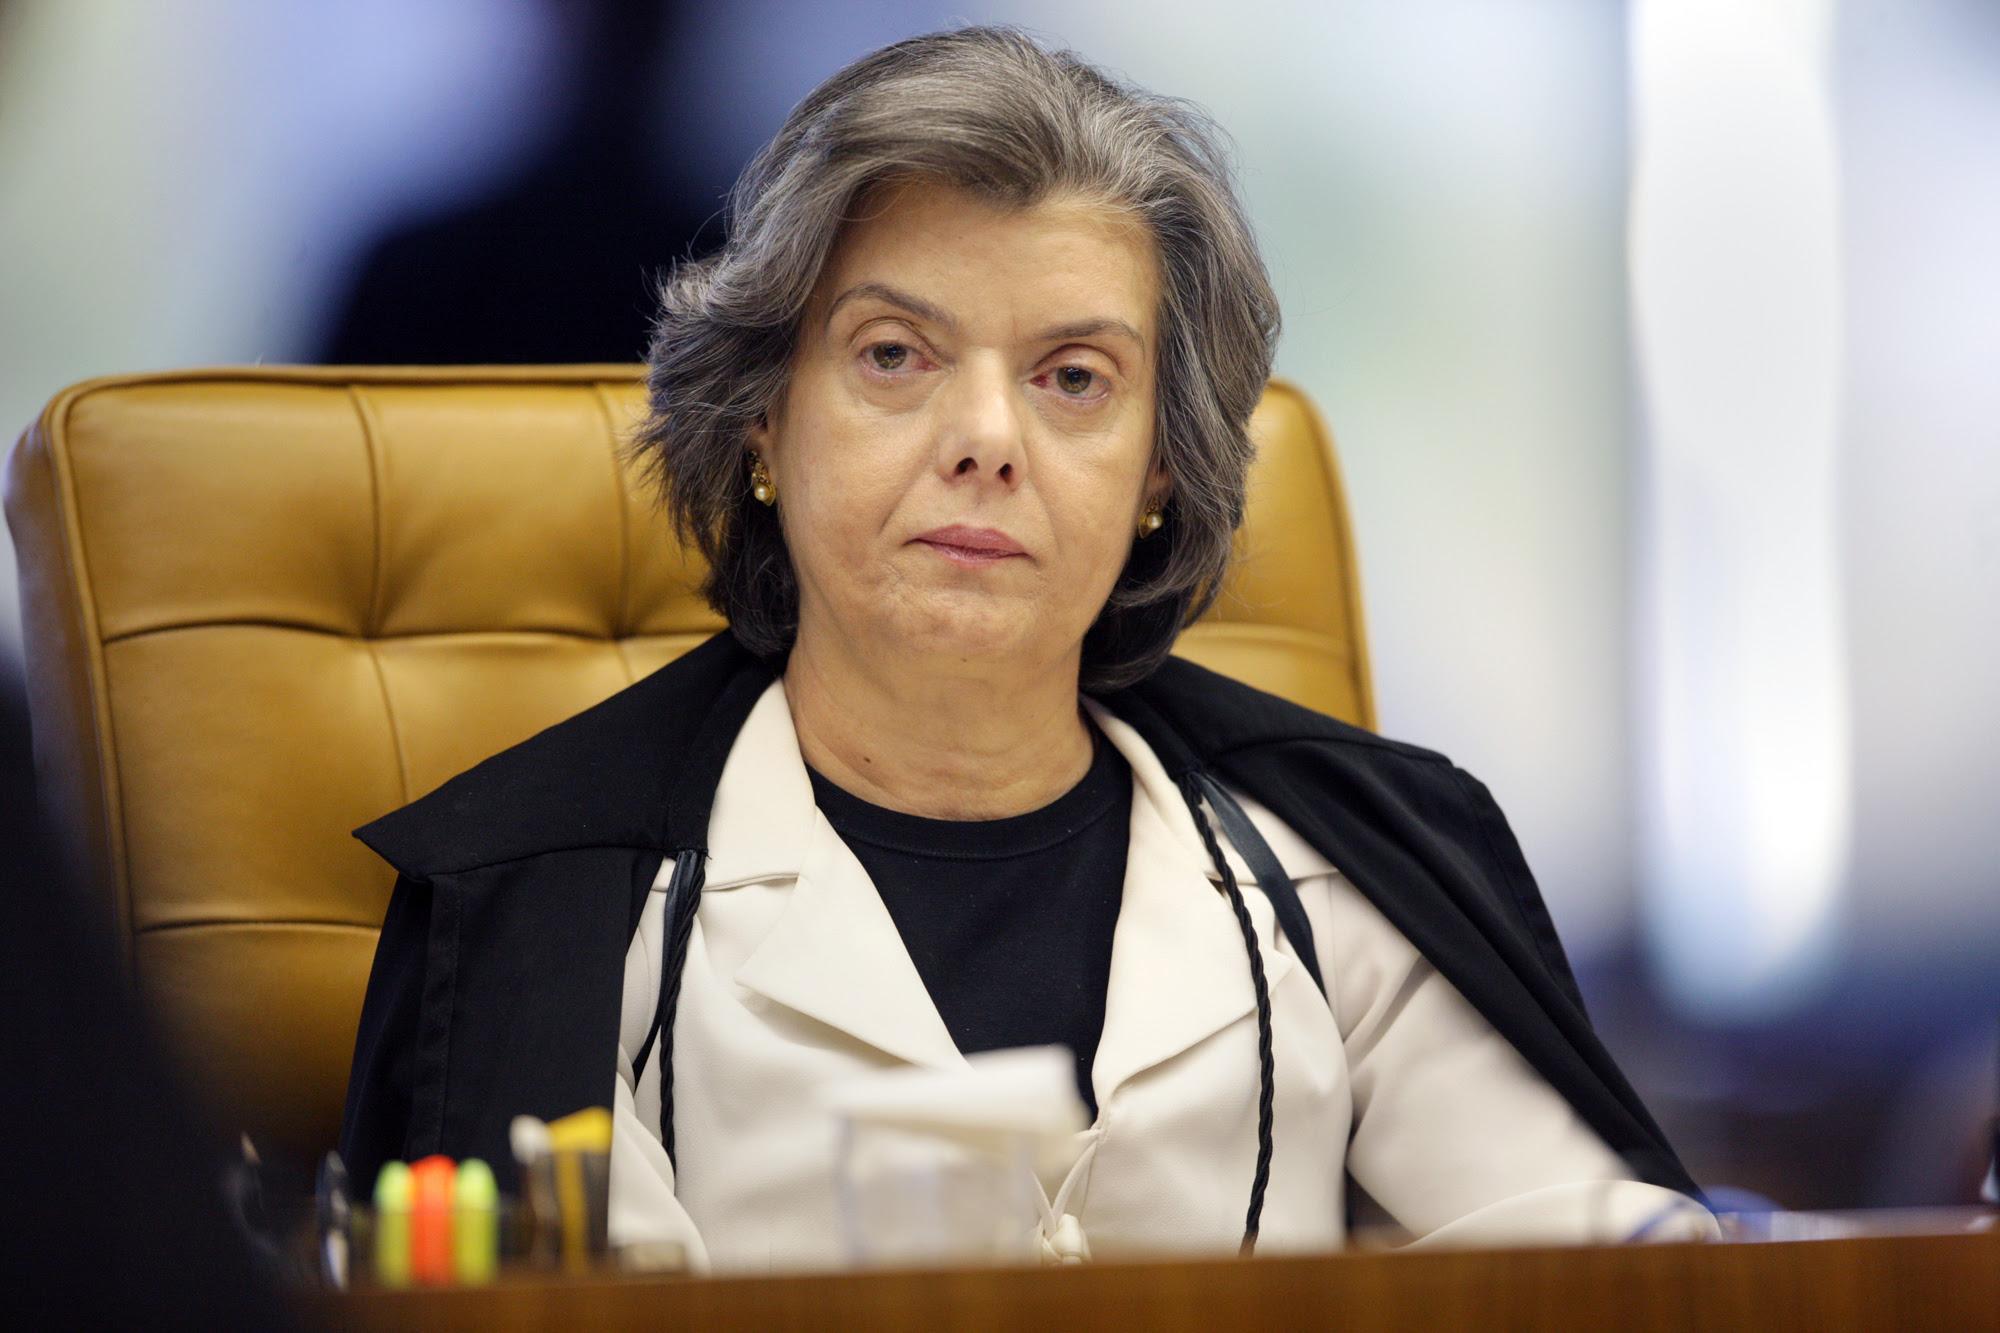 Carmen Lúcia 2